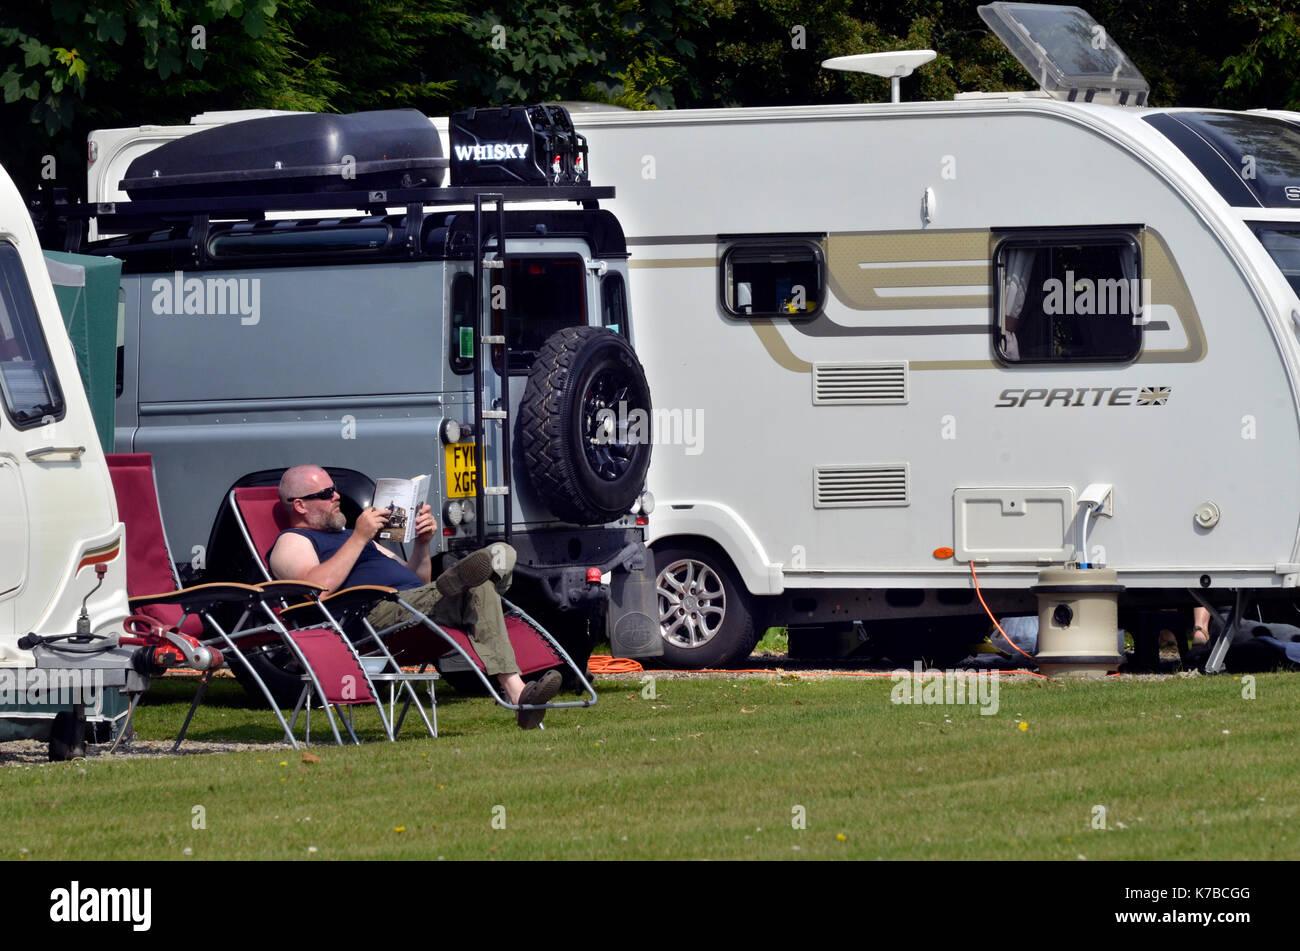 man on holiday  reading outside caravan - Stock Image